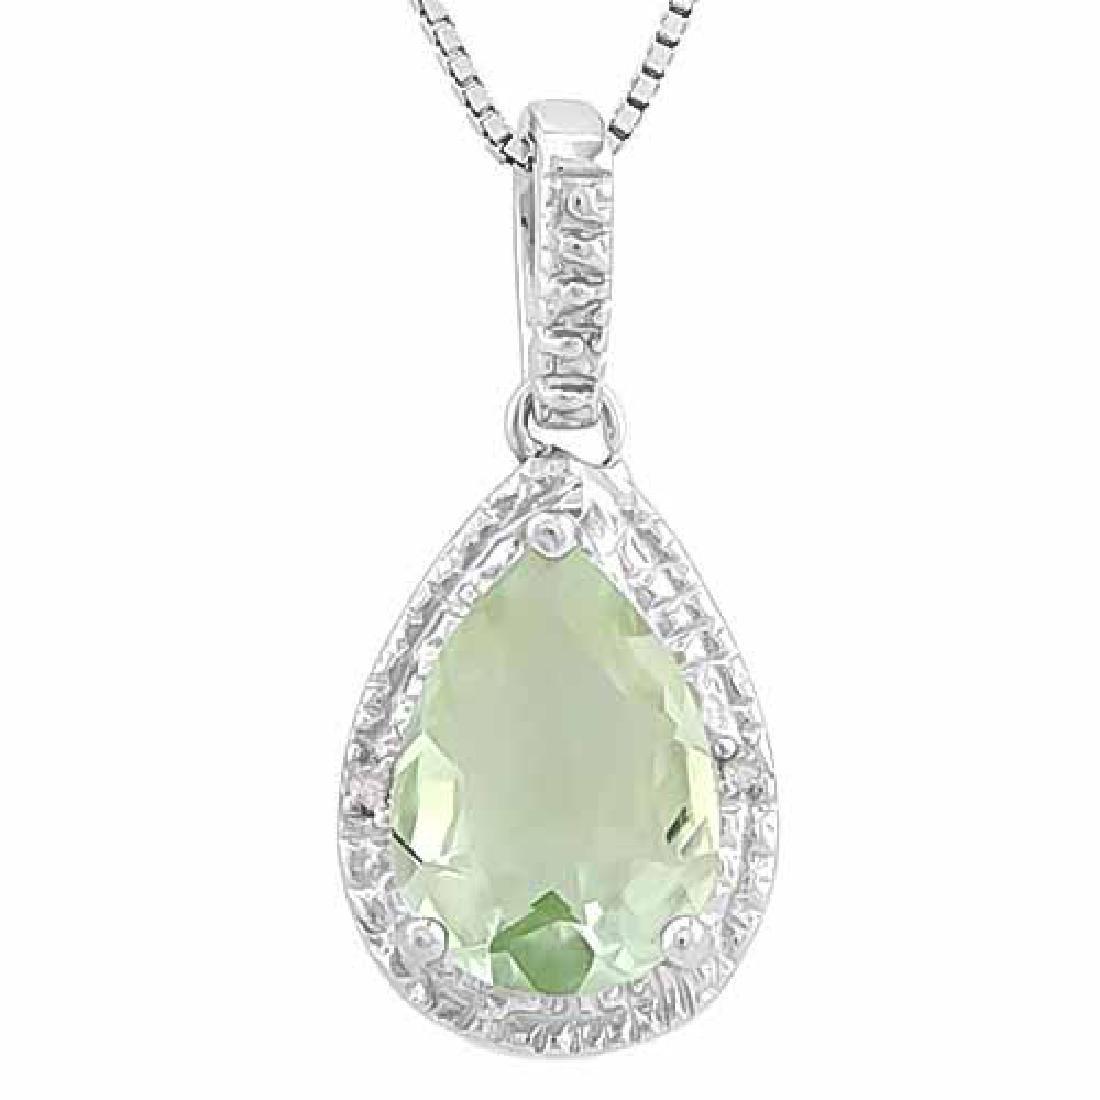 2.34 CT GREEN AMETHYST & 2PCS GENUINE DIAMOND 925 STERL